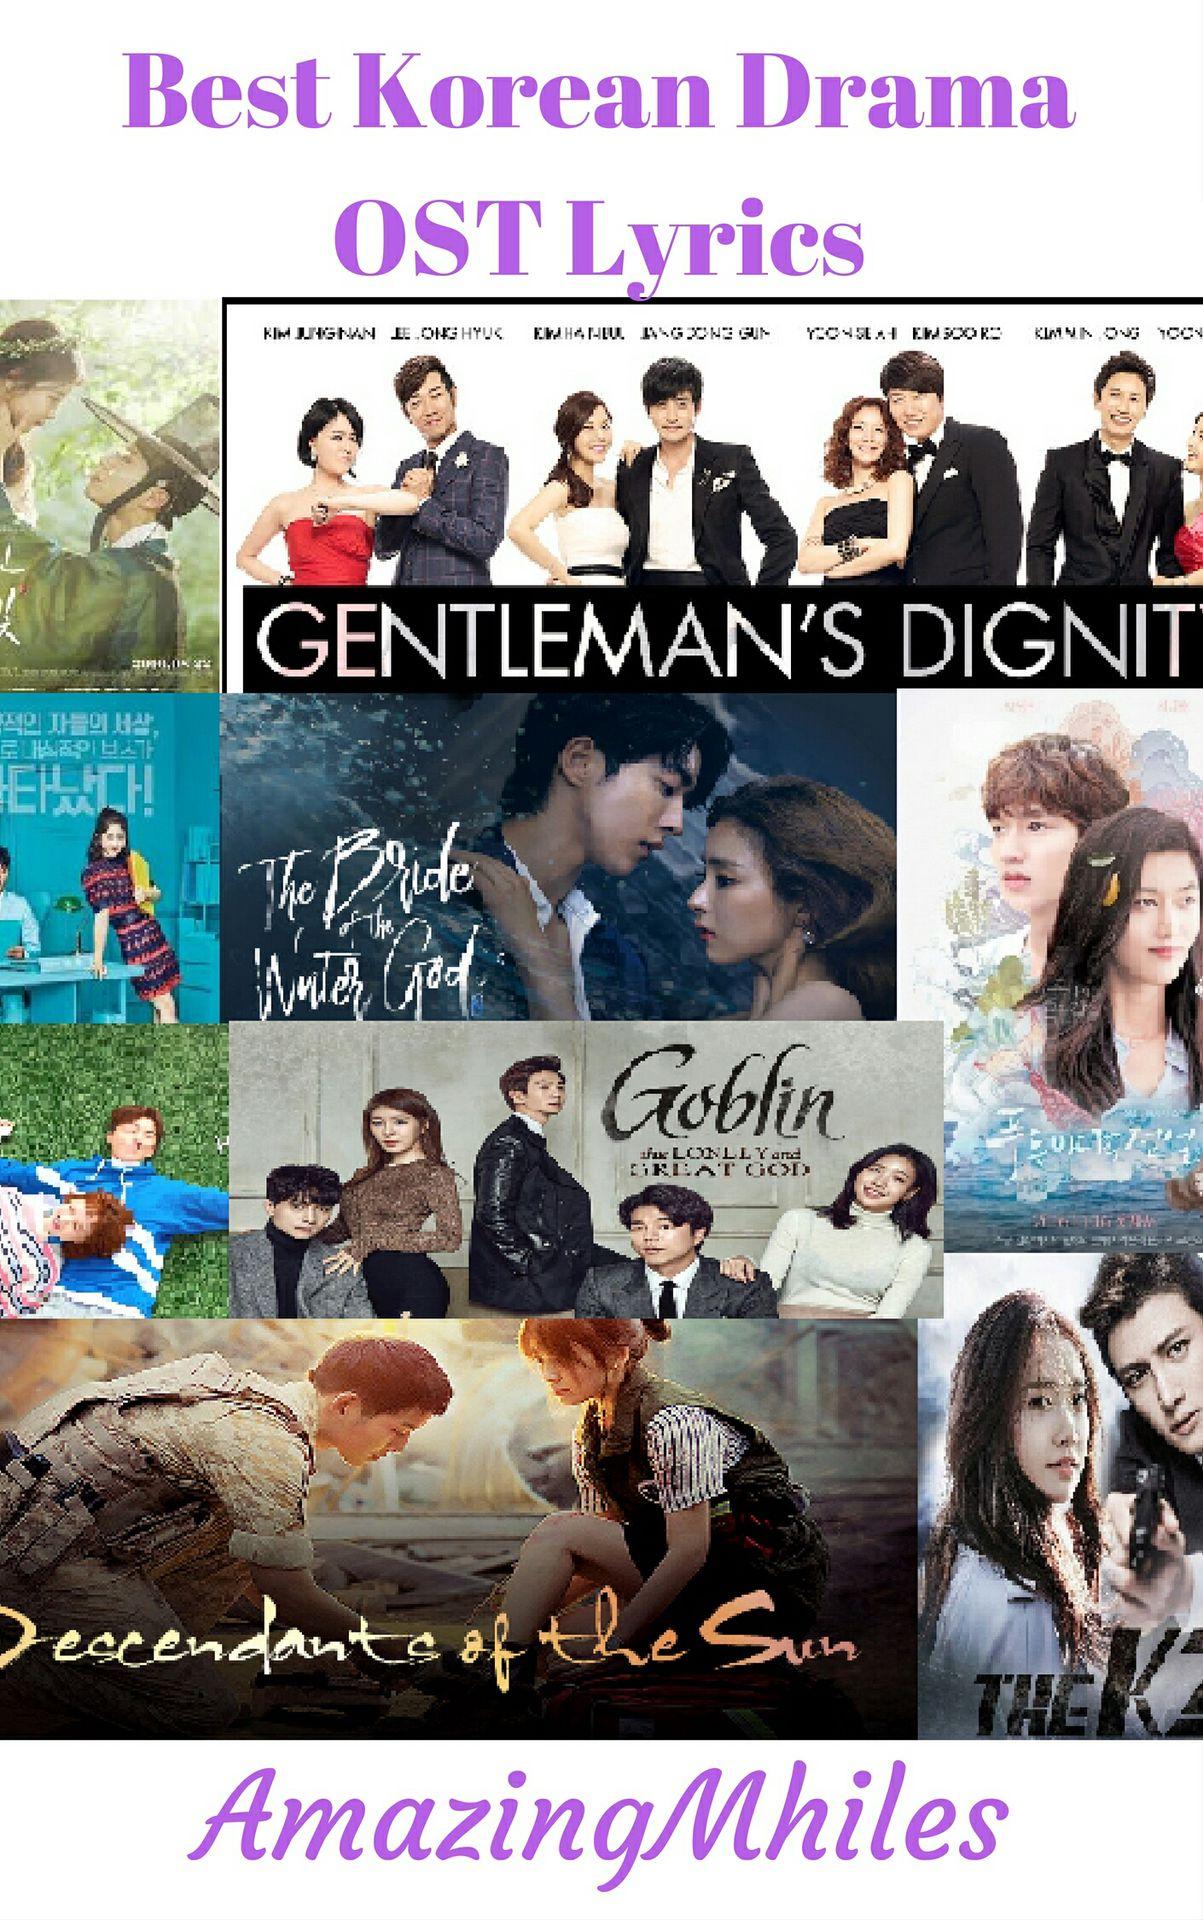 Best Korean Drama Series OST Lyrics - Author's Note - Wattpad